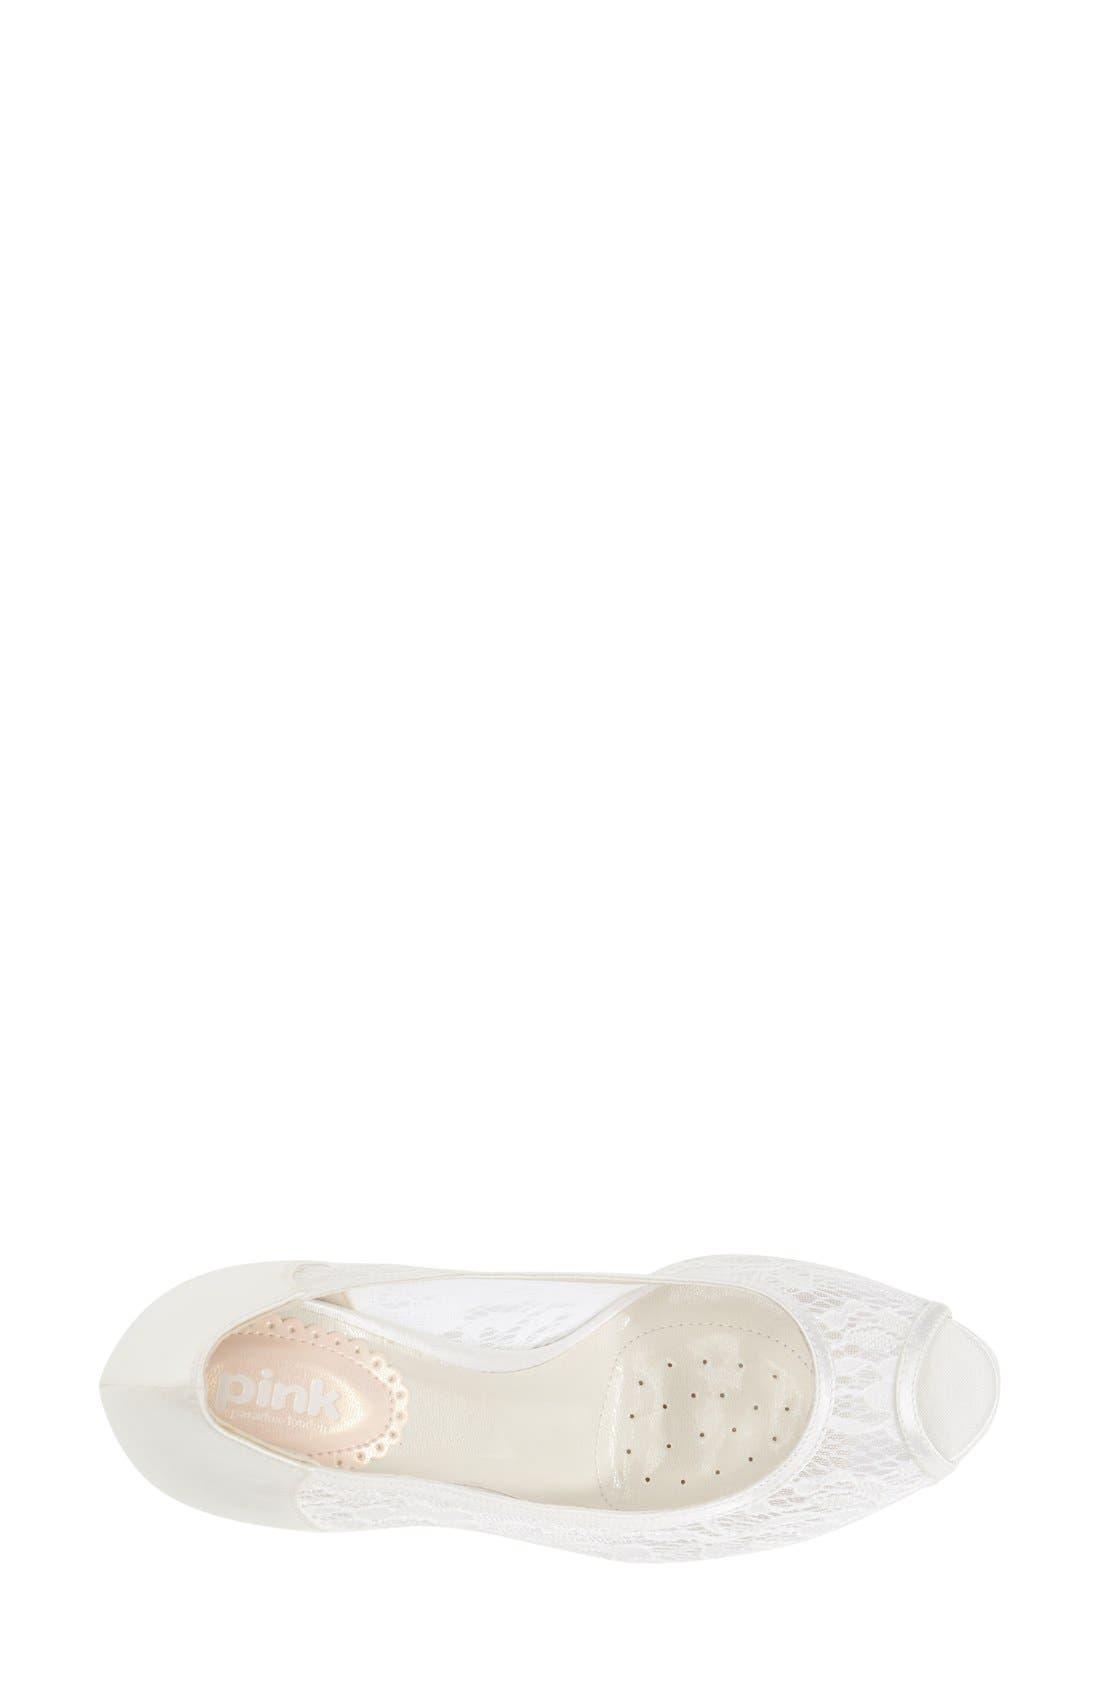 'Scrumptious' Lace Peep Toe Sandal,                             Alternate thumbnail 3, color,                             IVORY MESH LACE